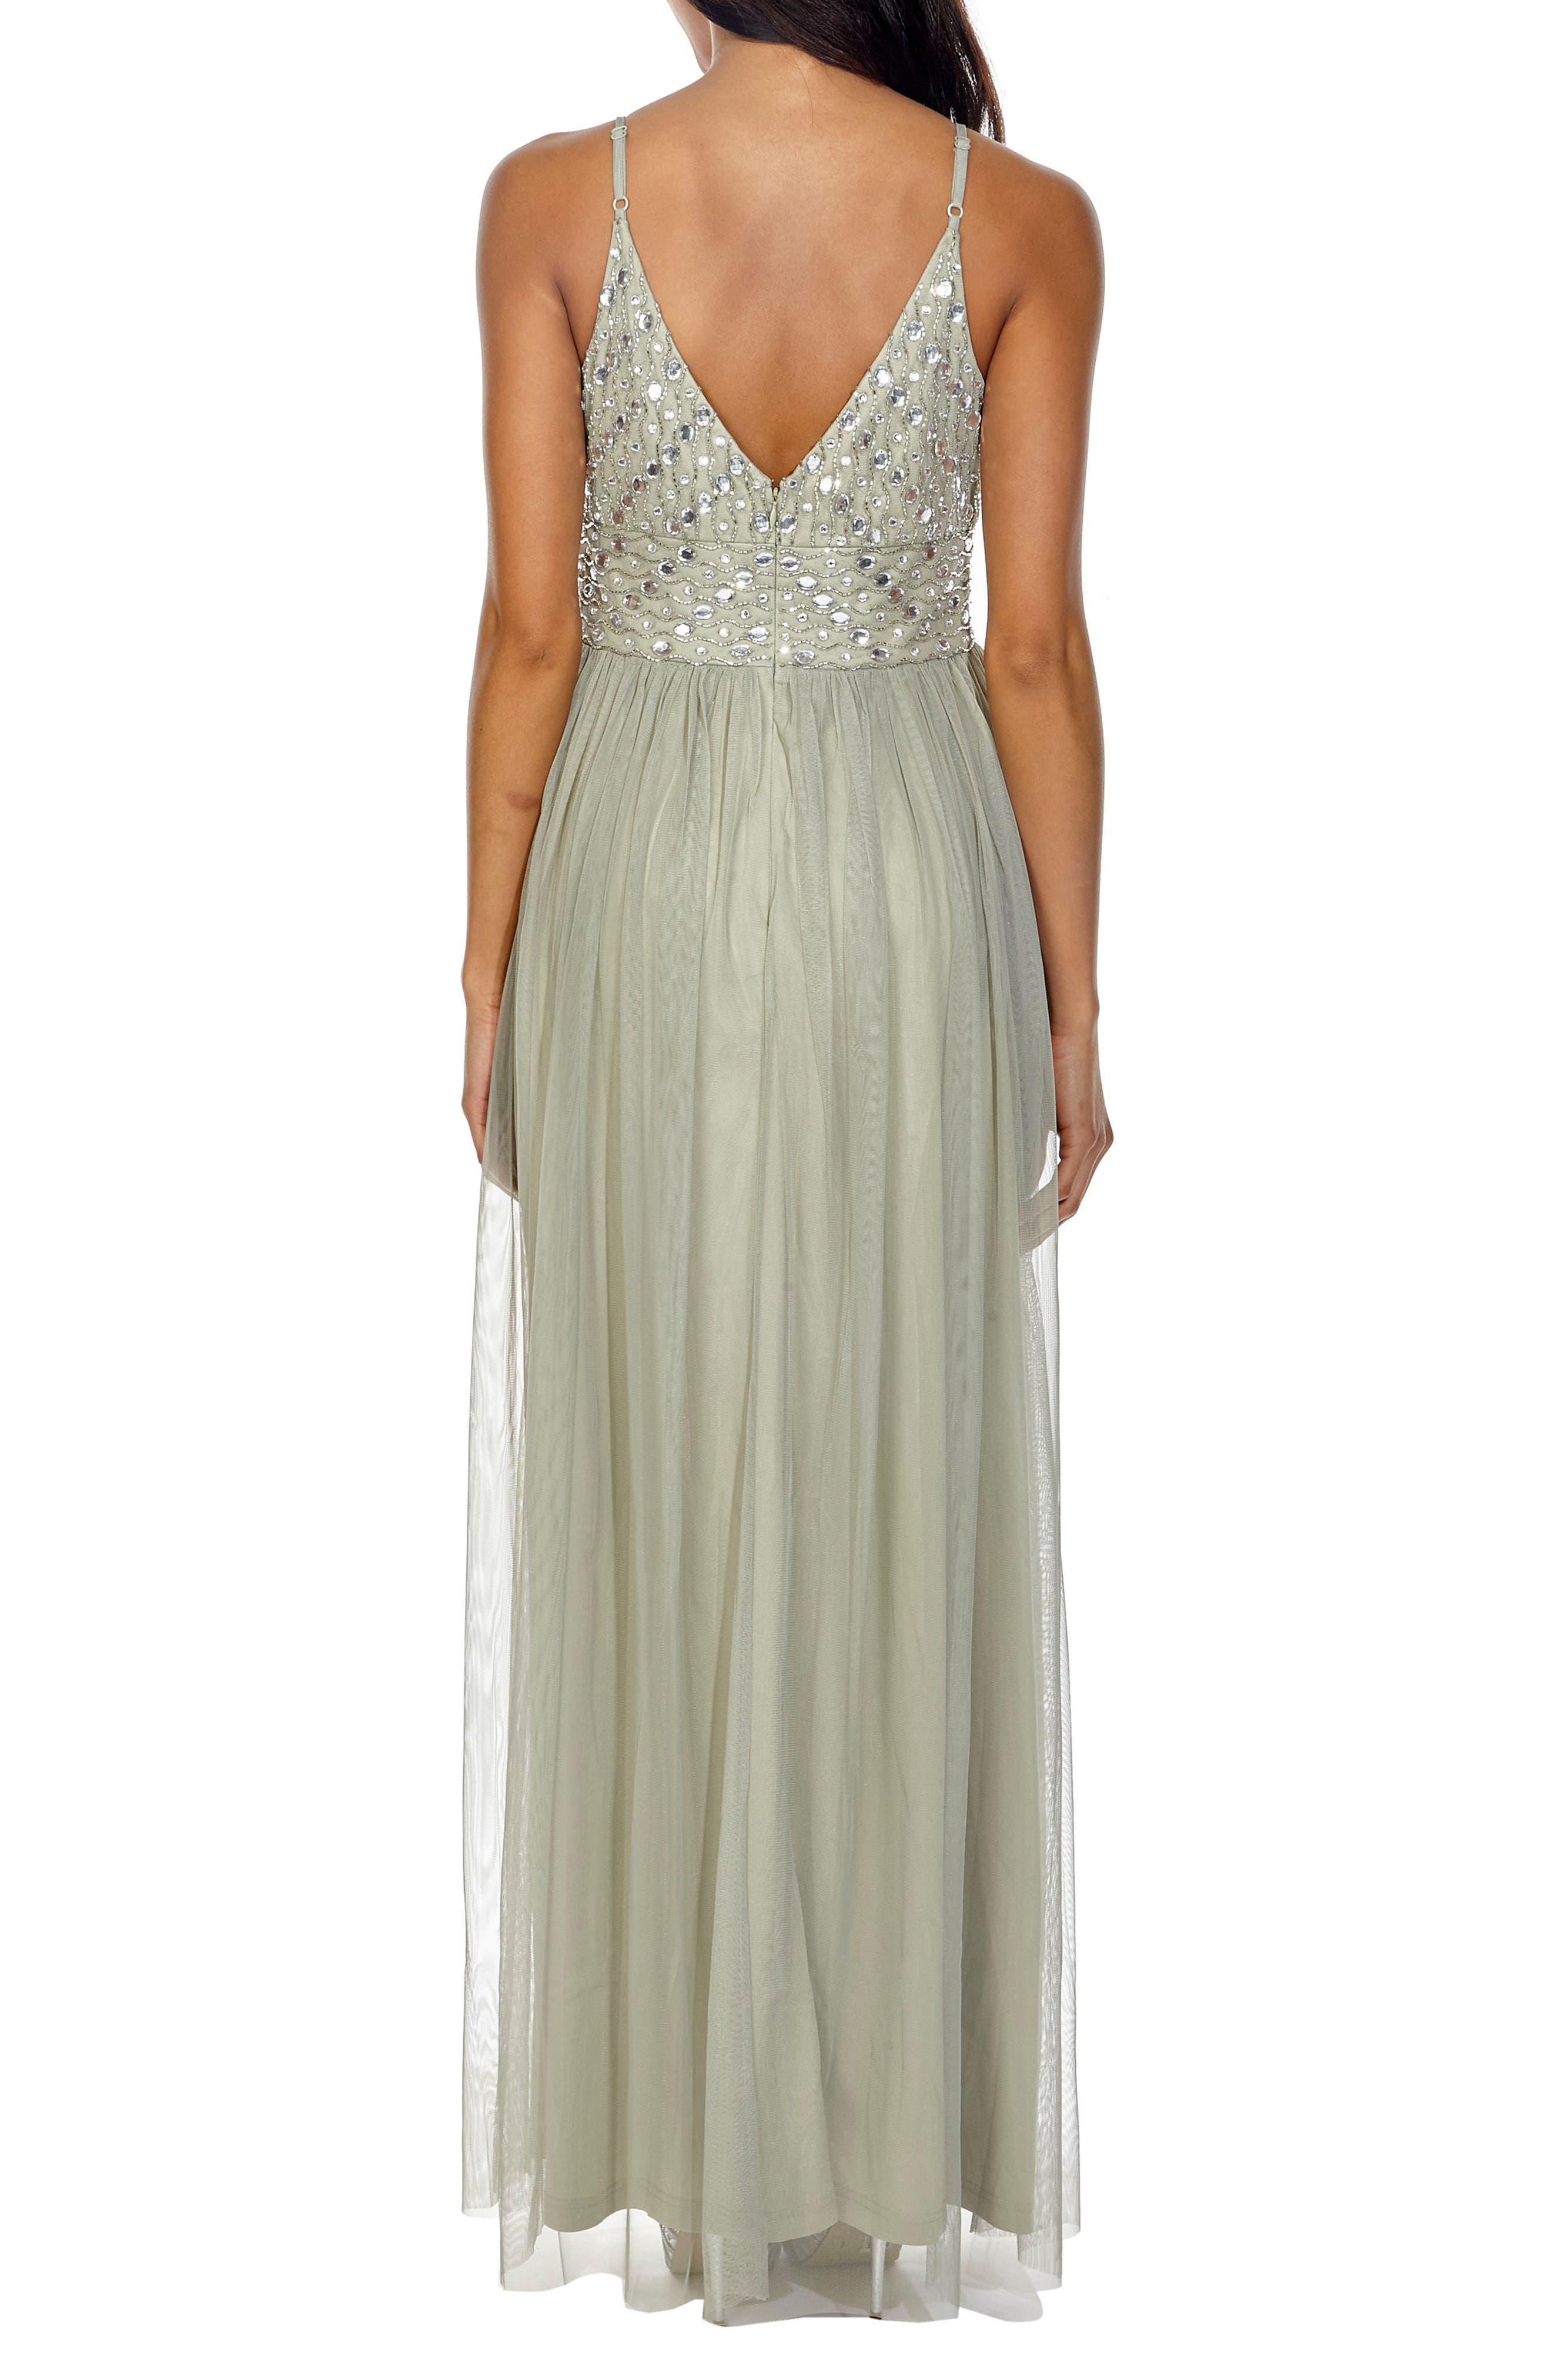 Maeve Beaded Maxi Dress,                             Alternate thumbnail 2, color,                             330